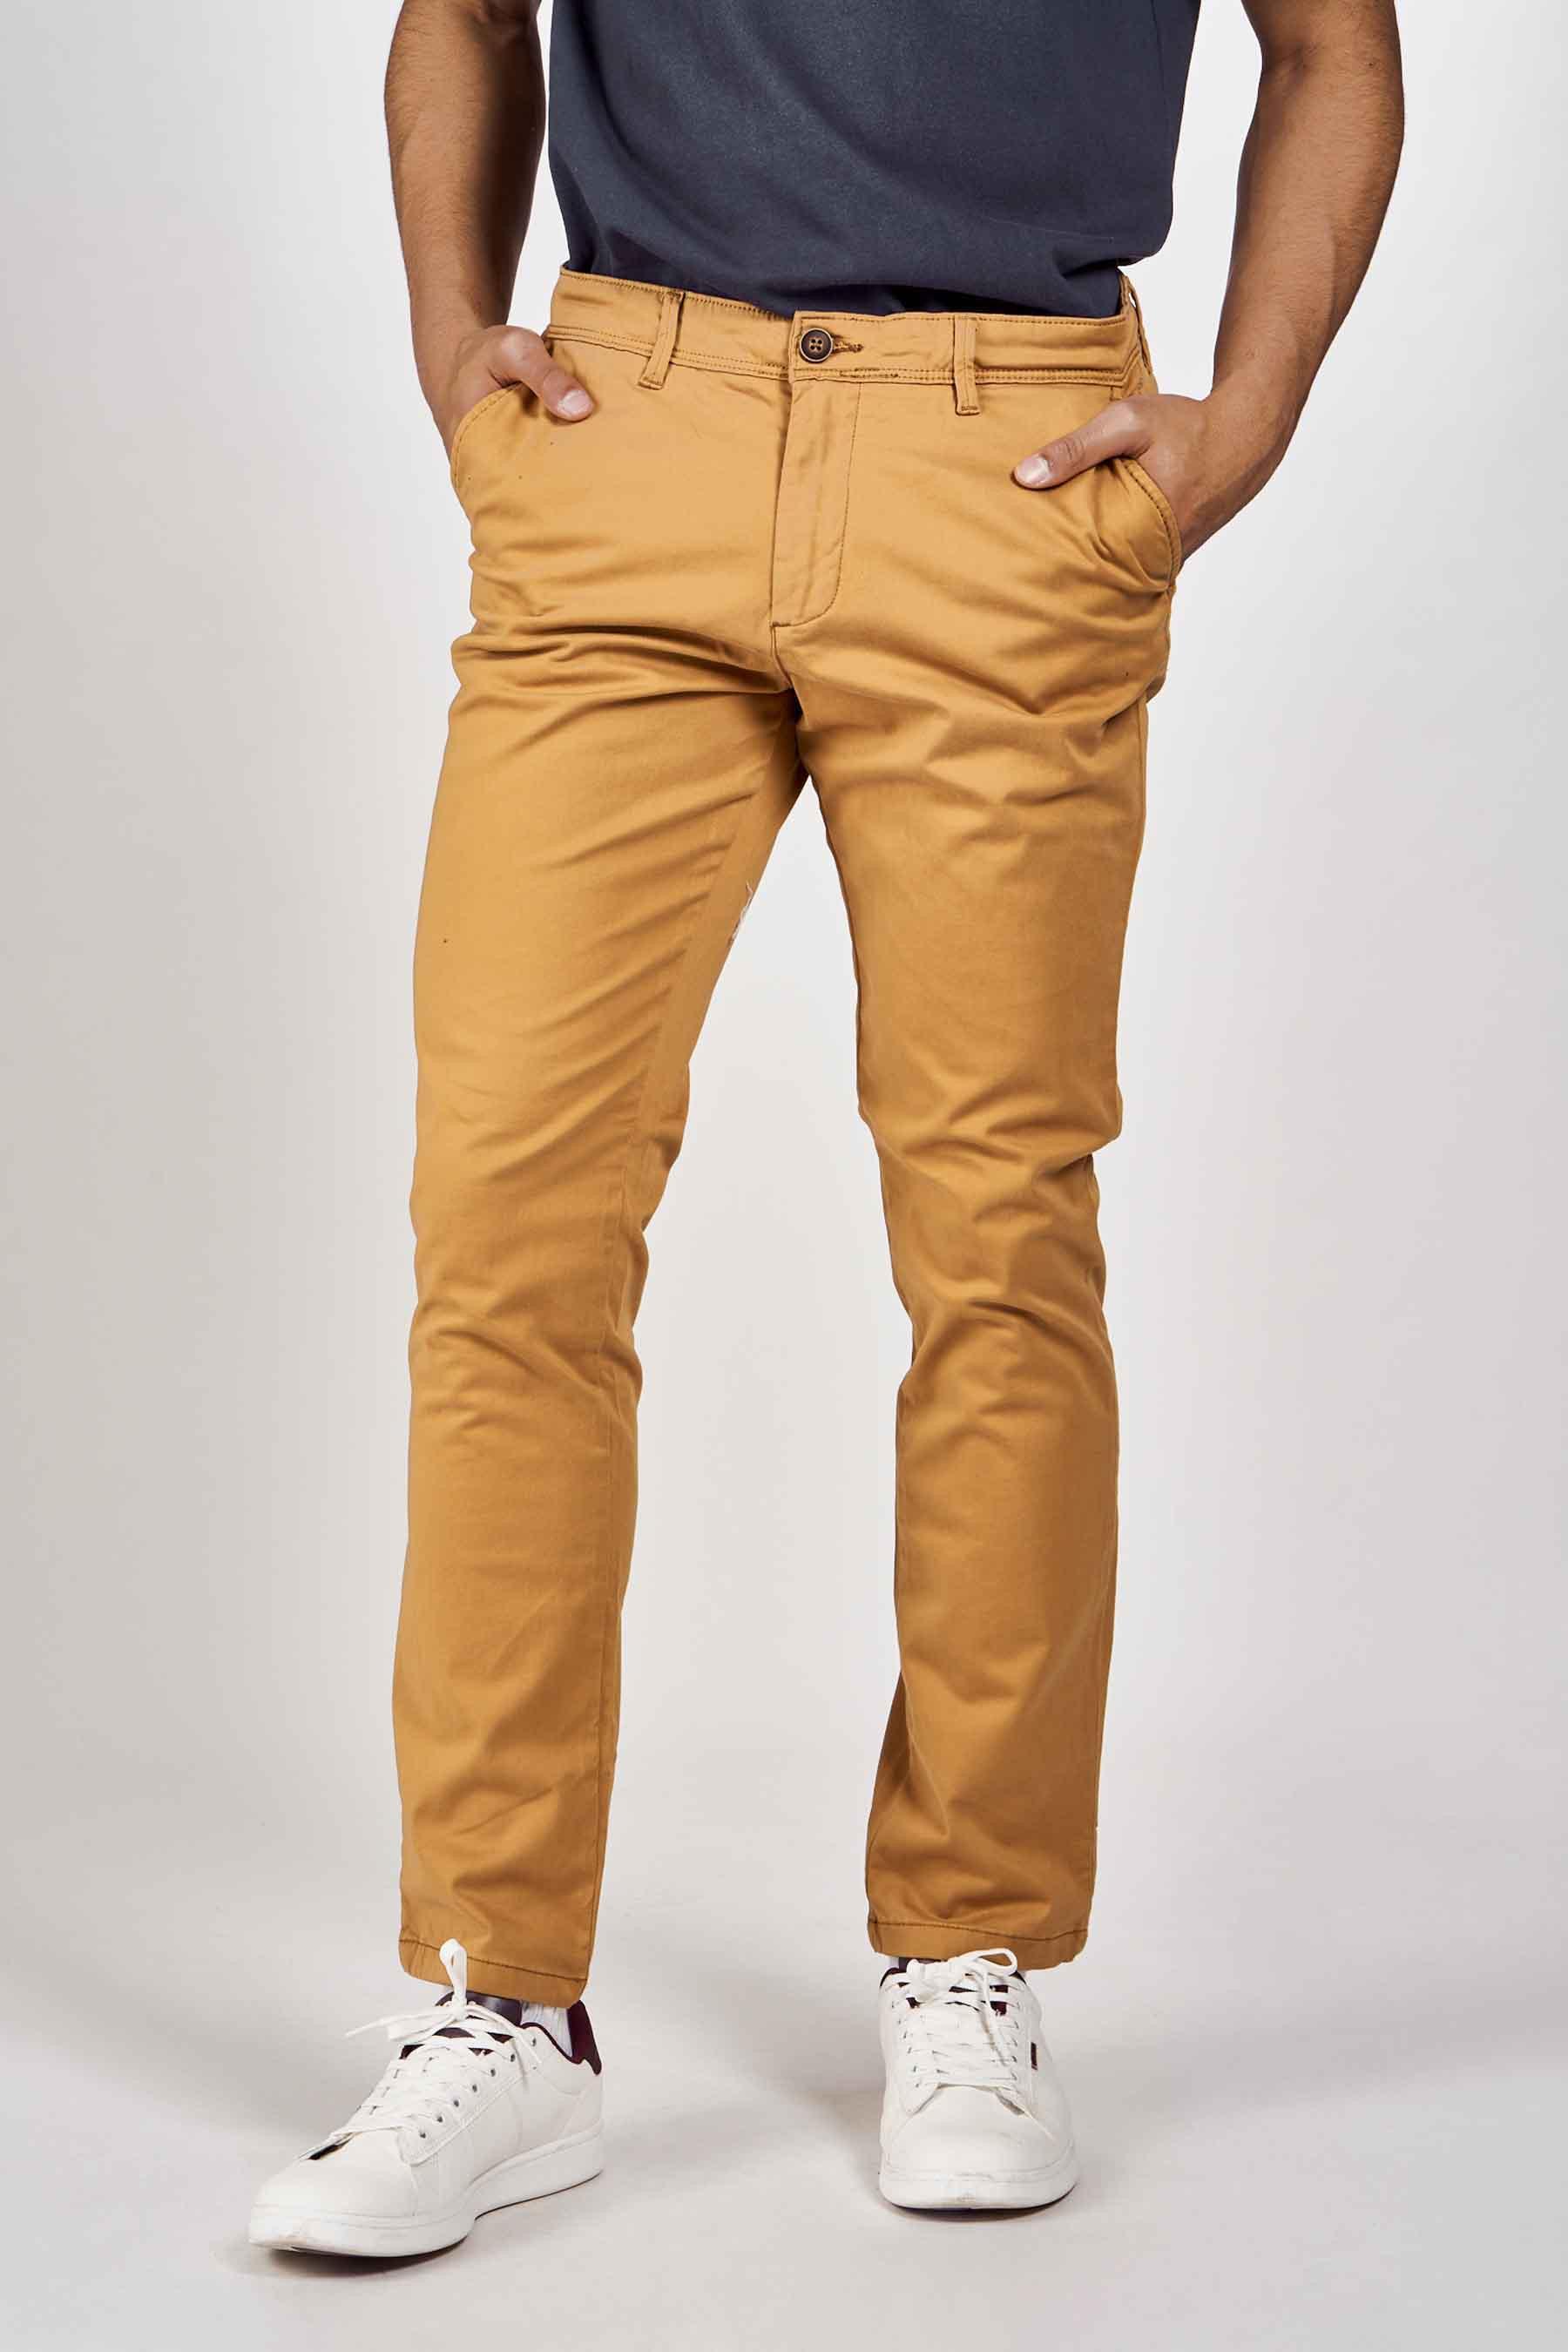 Jack & Jones Jeans Intelligenc Chino, Bruin, Heren, Maat: 29x32/31x34/32x34